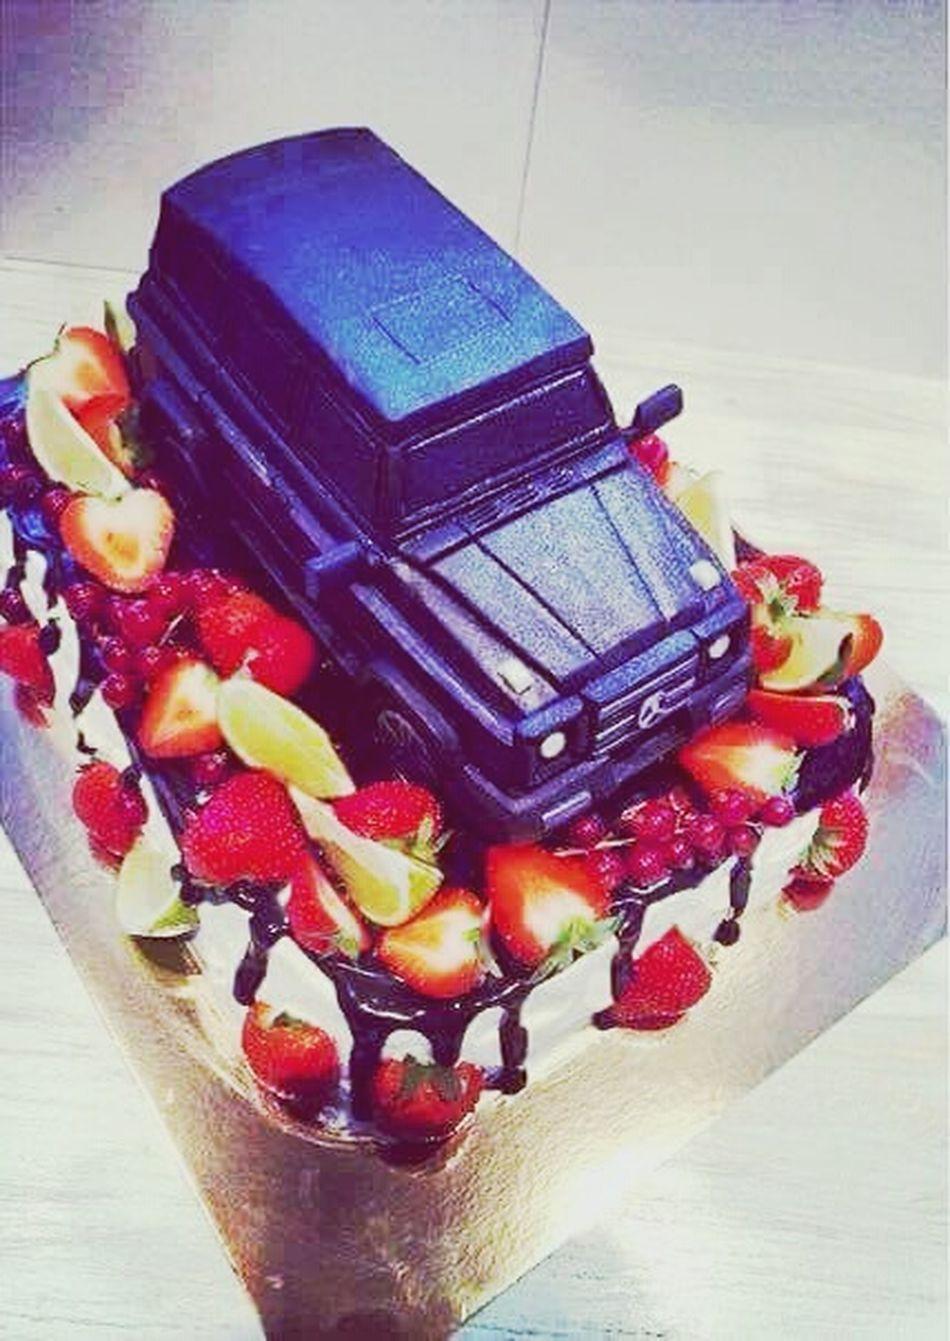 Hello World Cake Time Yamm Yamm Yammy :) Mercedes Gt Gelendvagen AMG Eating Cake 🎂🎂🎂🍰🍰🚗🚗